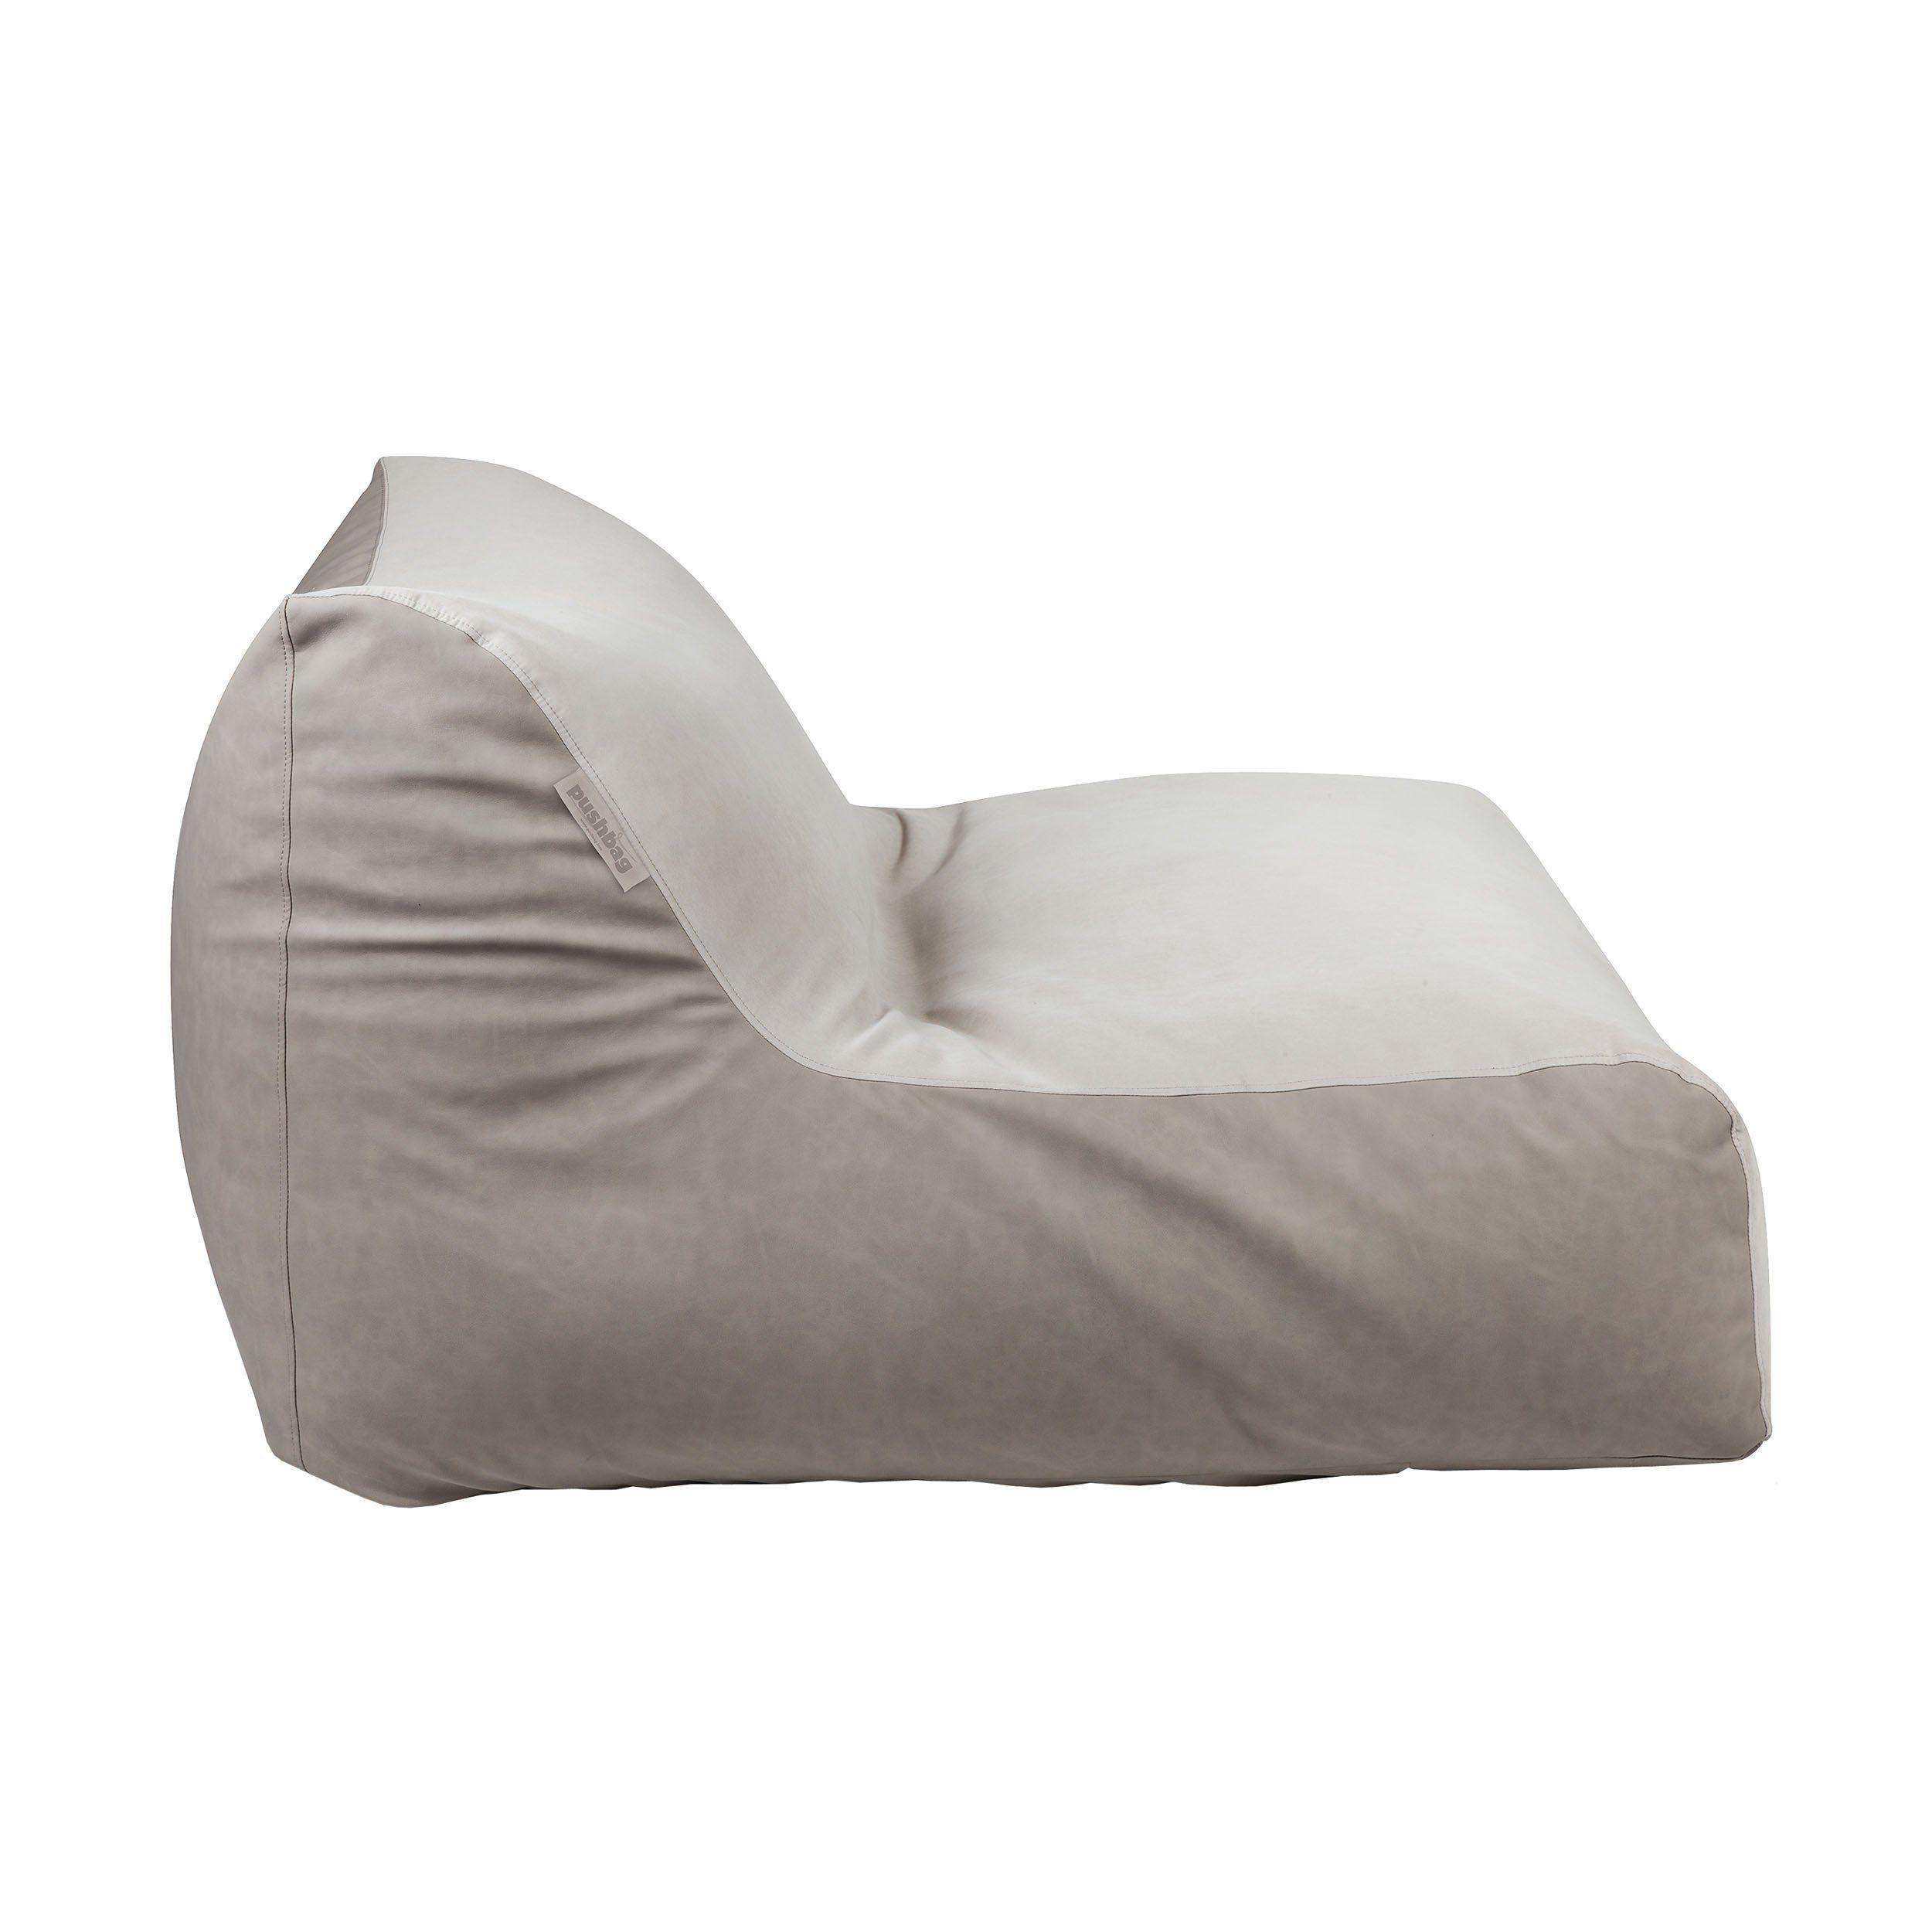 Global Bedding Outdoor-Loungemöbel »Pushbag Chair«